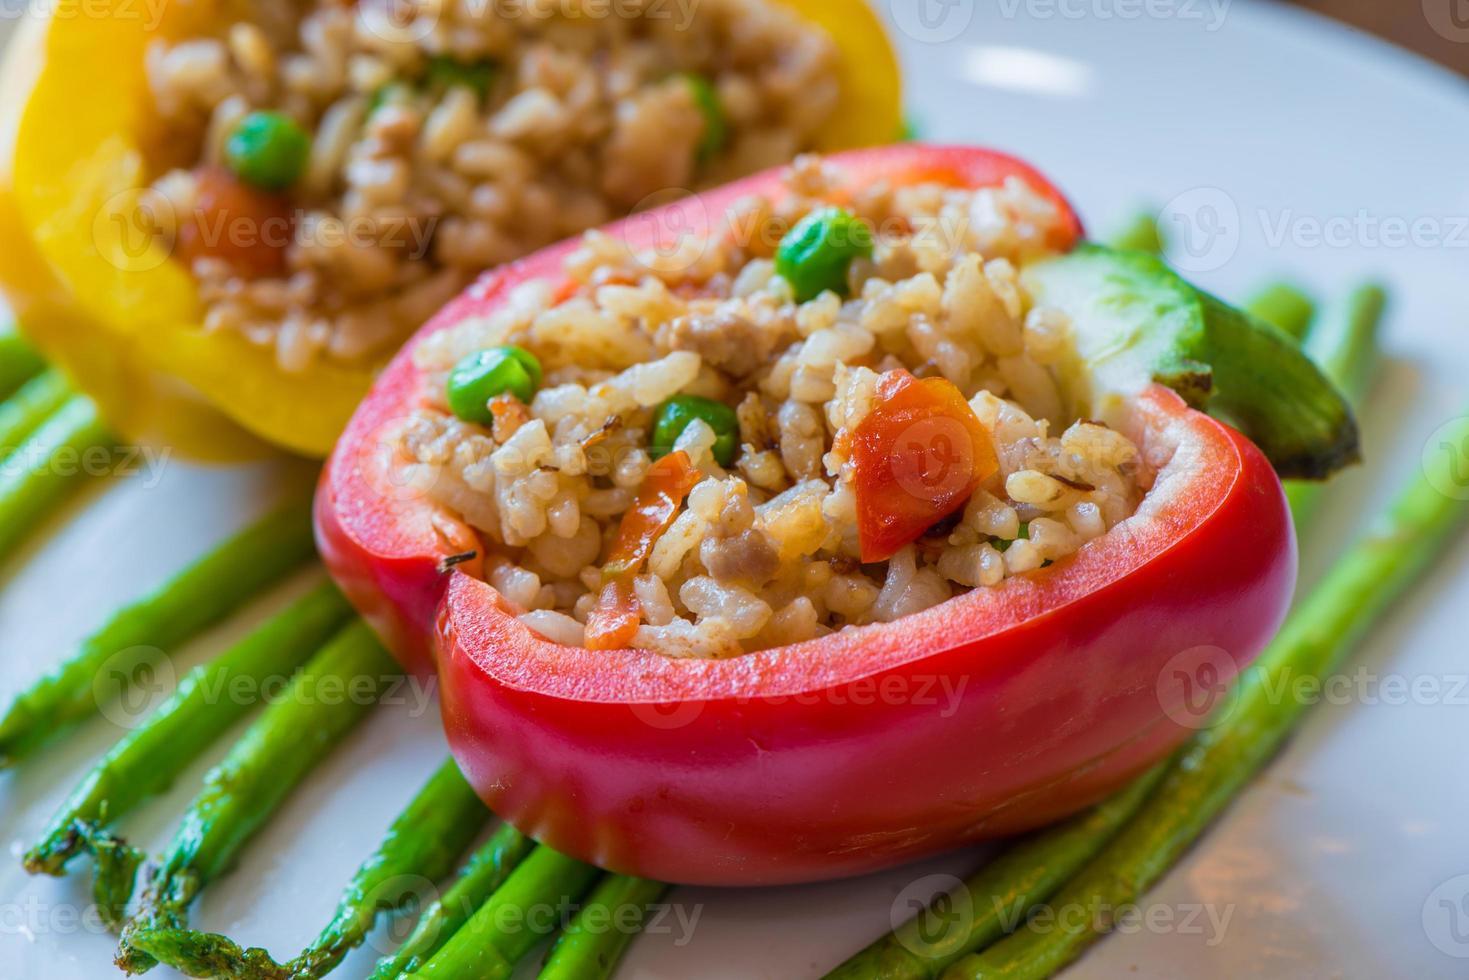 ris pilaf med färgglad grönsak i röd paprika foto